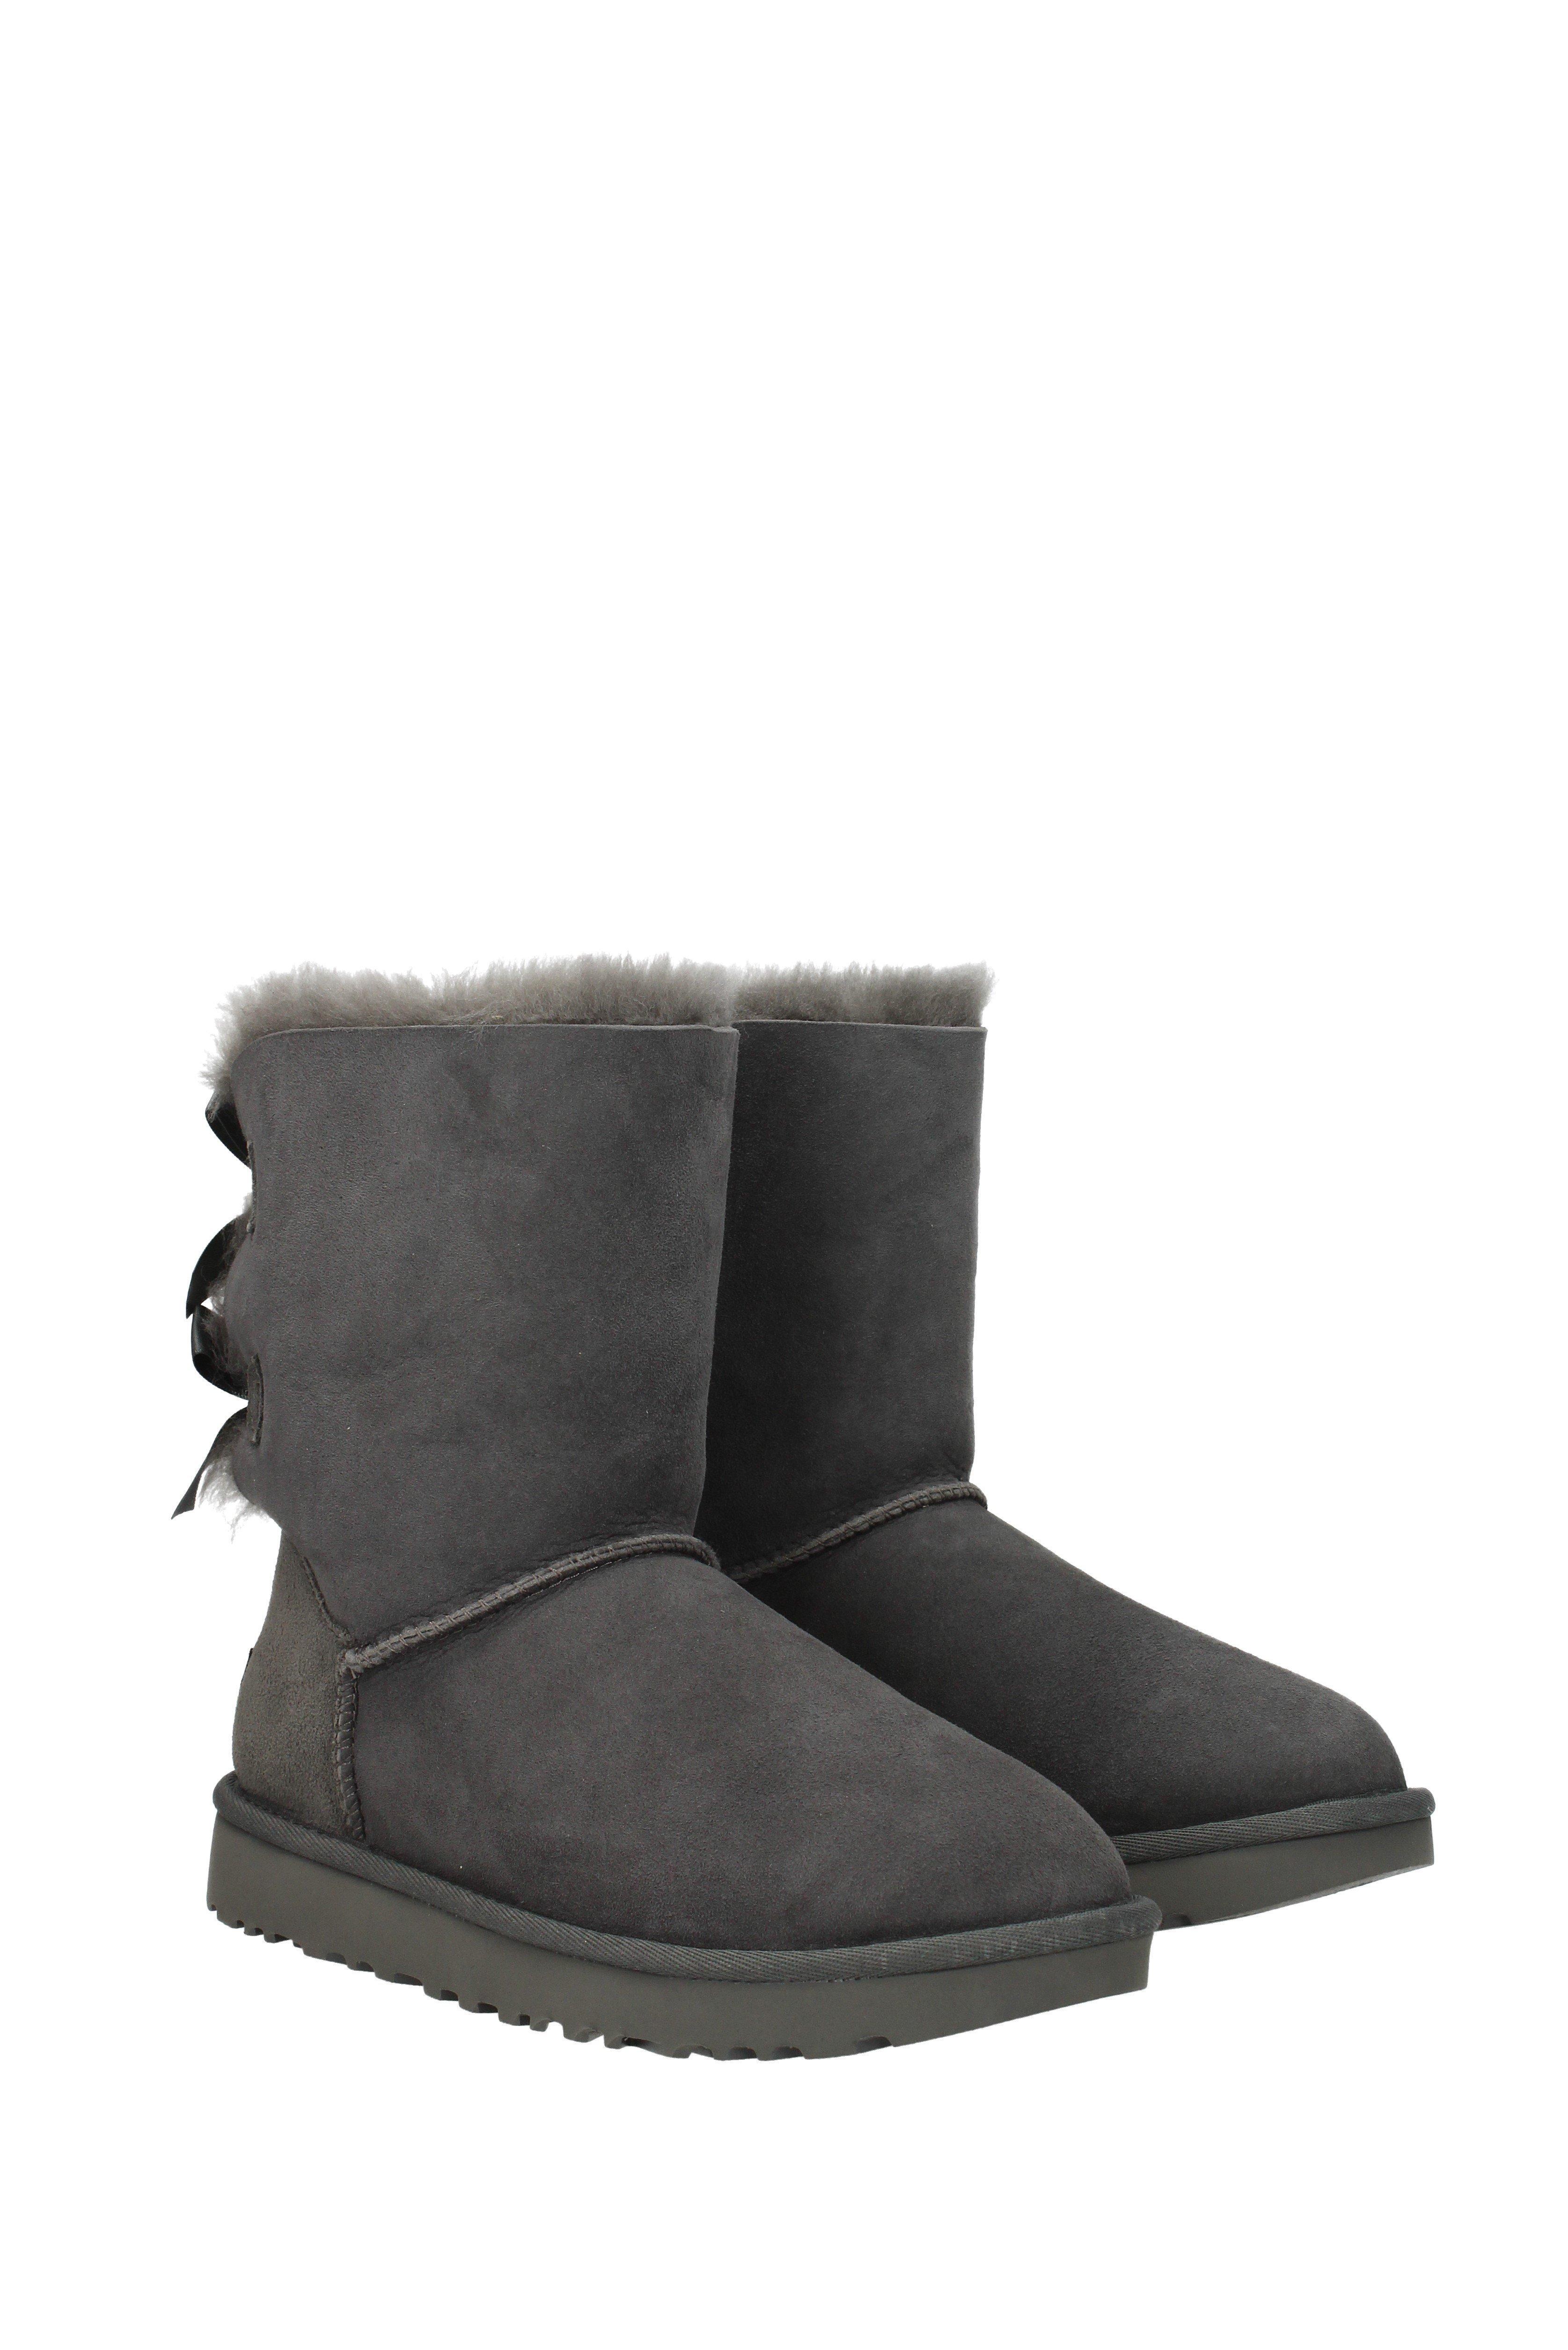 c338c0b41d6 Ankle Boots Tread Lite Bailey Bow Ii Women Gray